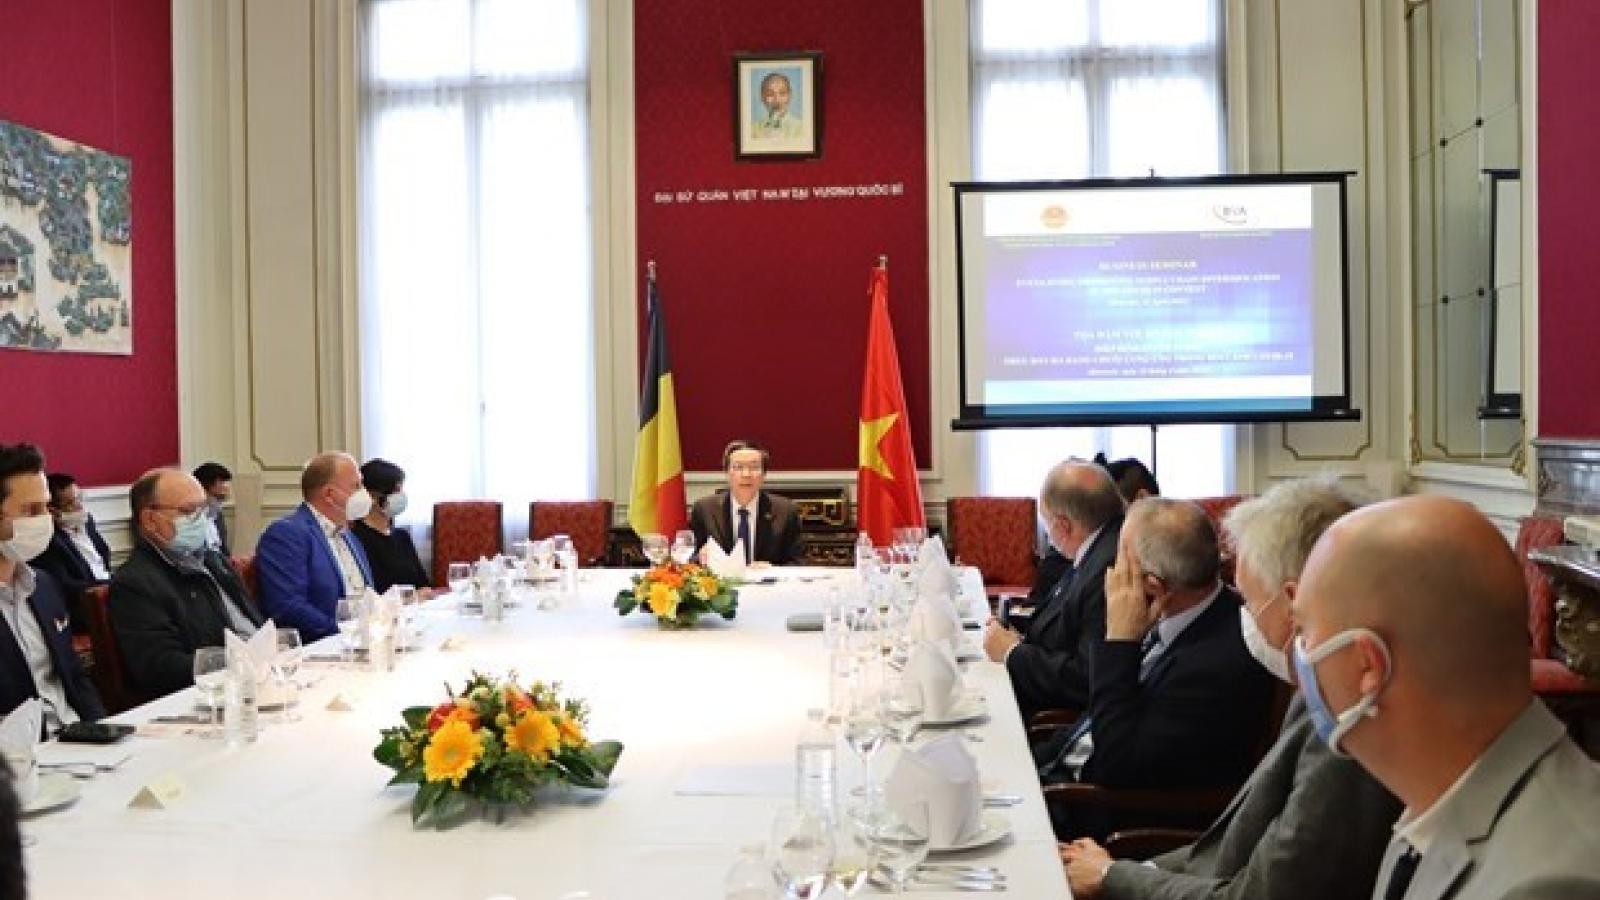 Belgium, Vietnam see growing multifaceted cooperation: Belgian politician